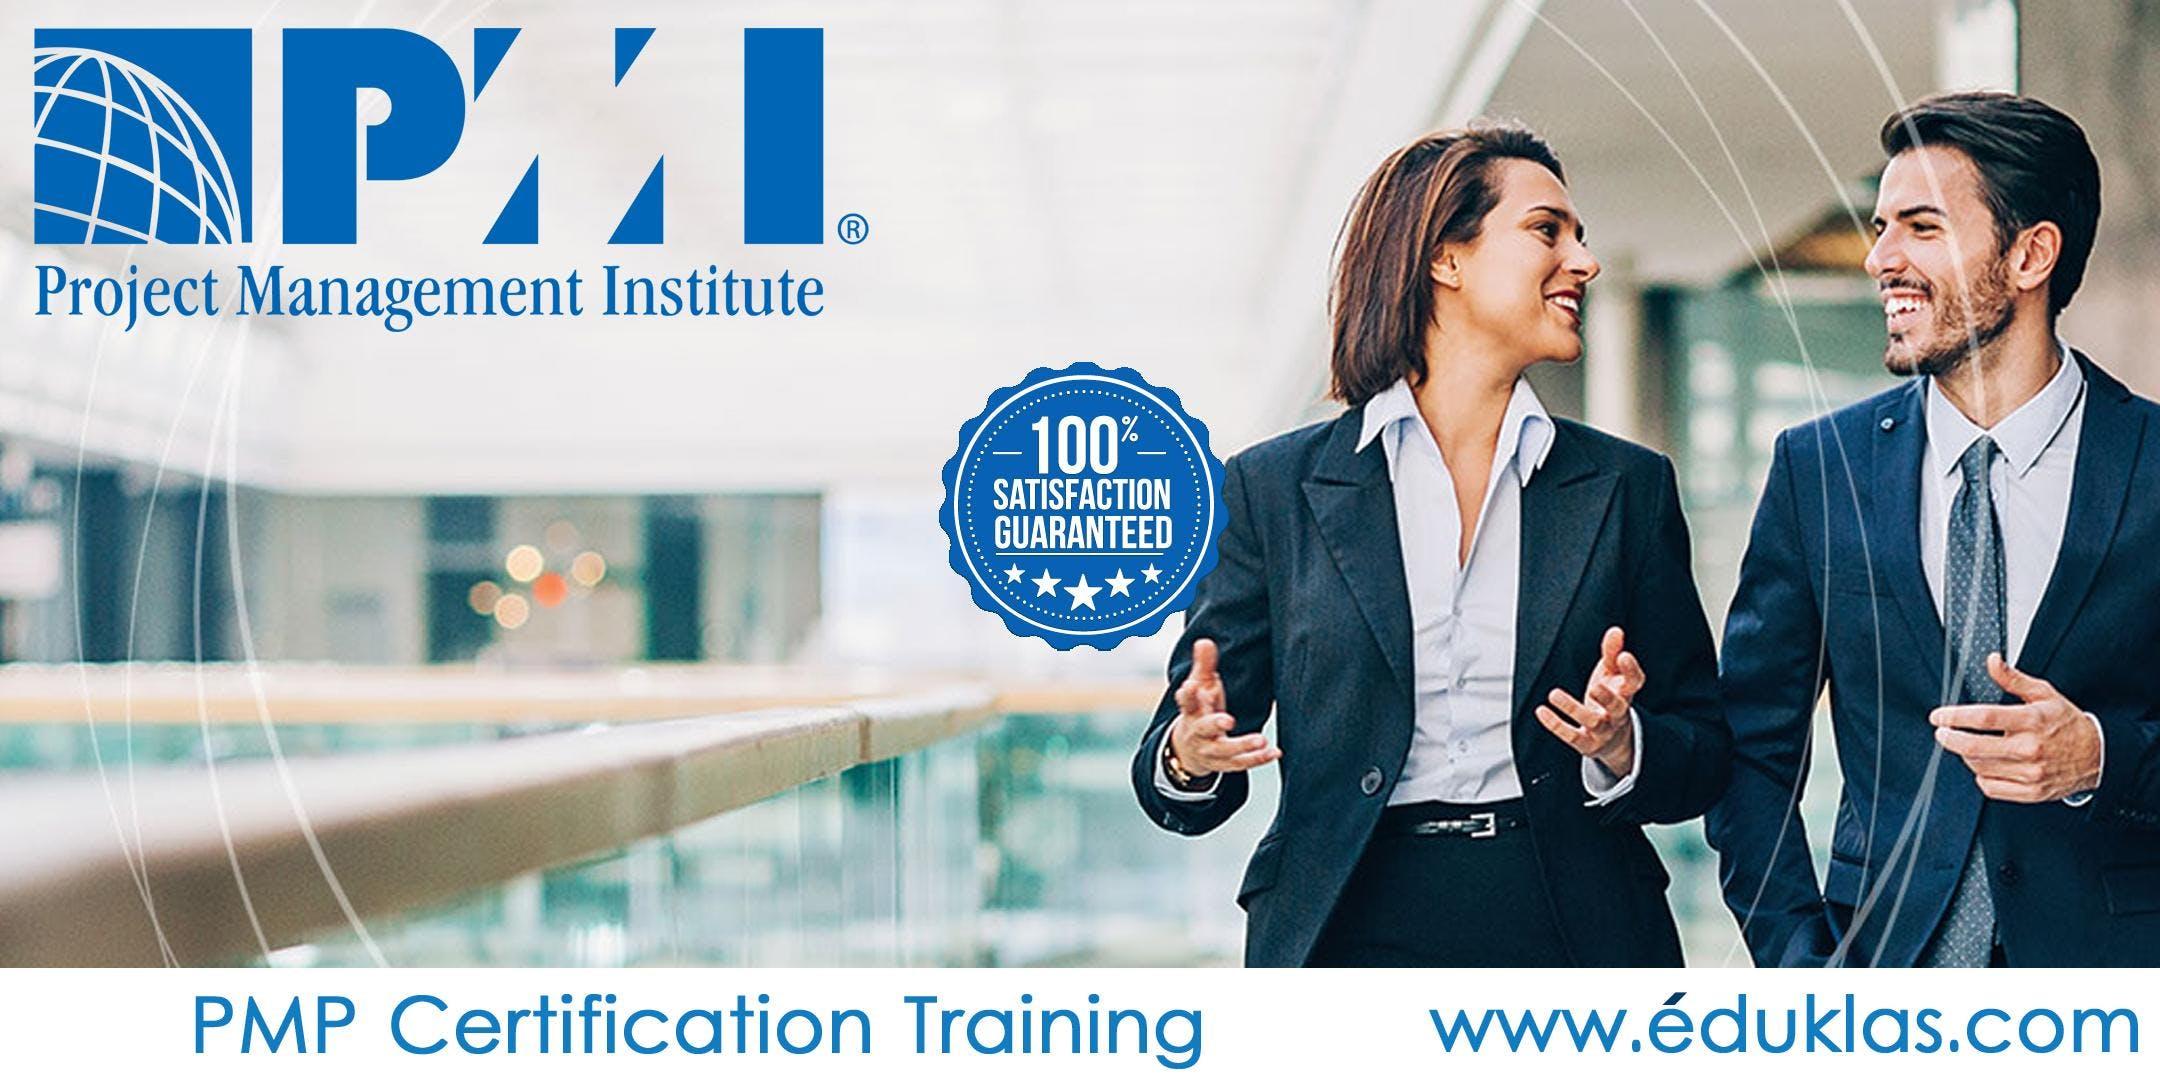 PMI - PMP Certification Training Course in ClarksvilleTNEduklas